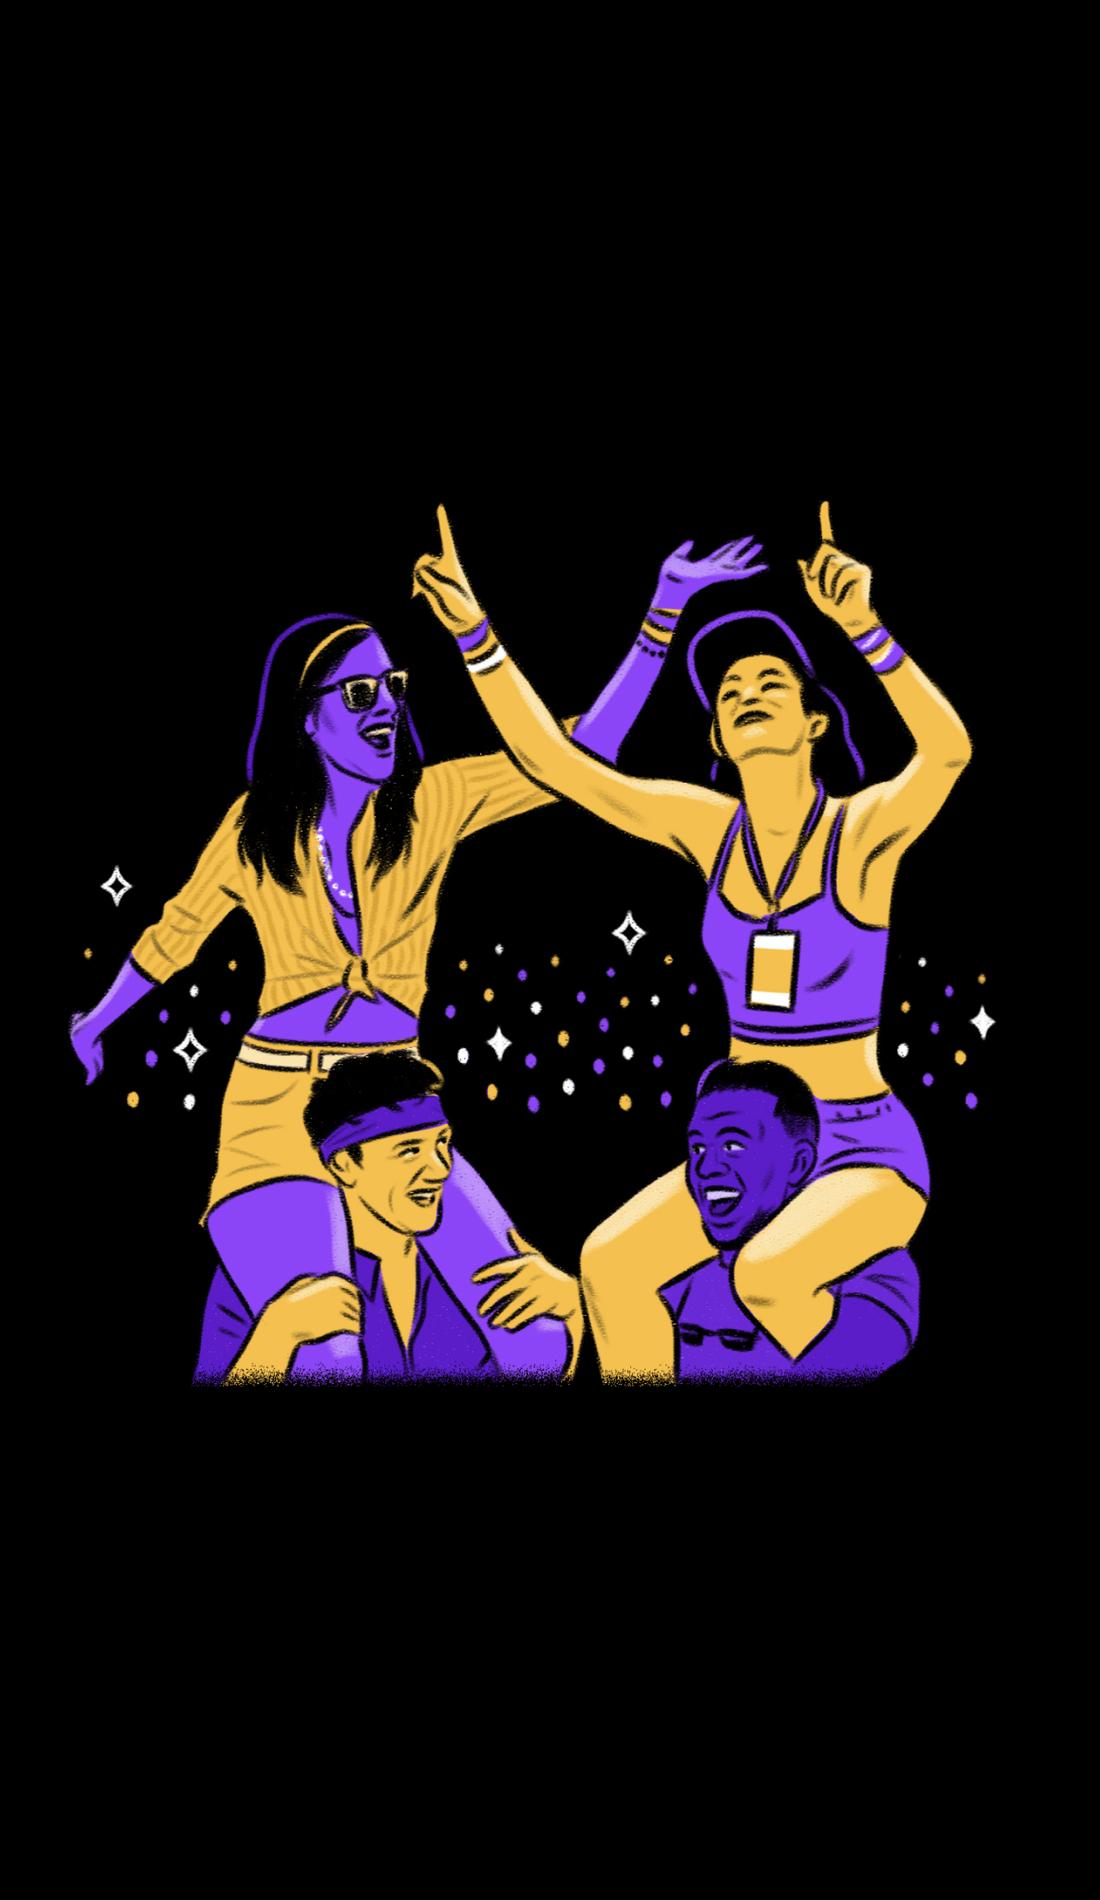 A Snowball Music Festival live event